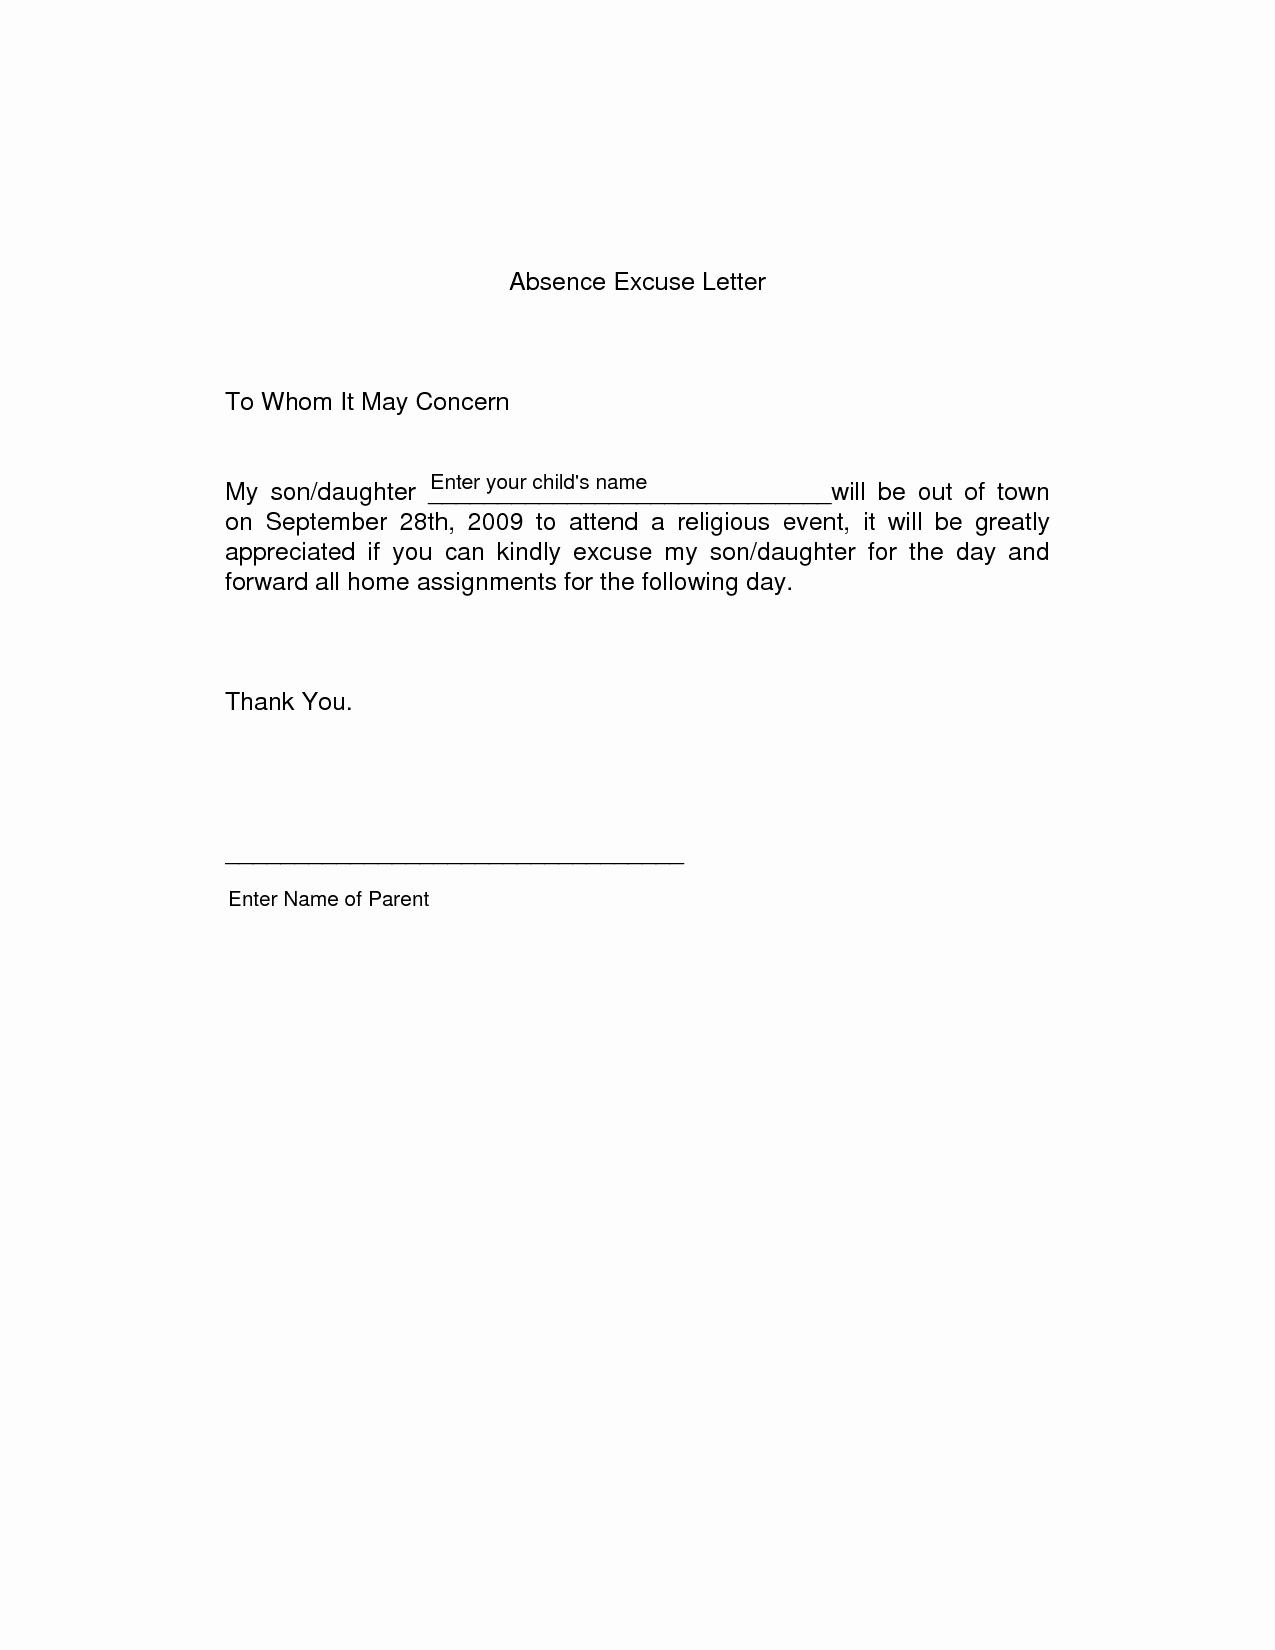 Absence Note for School Sample Luxury Leave Absence for University Homelightingcowarning